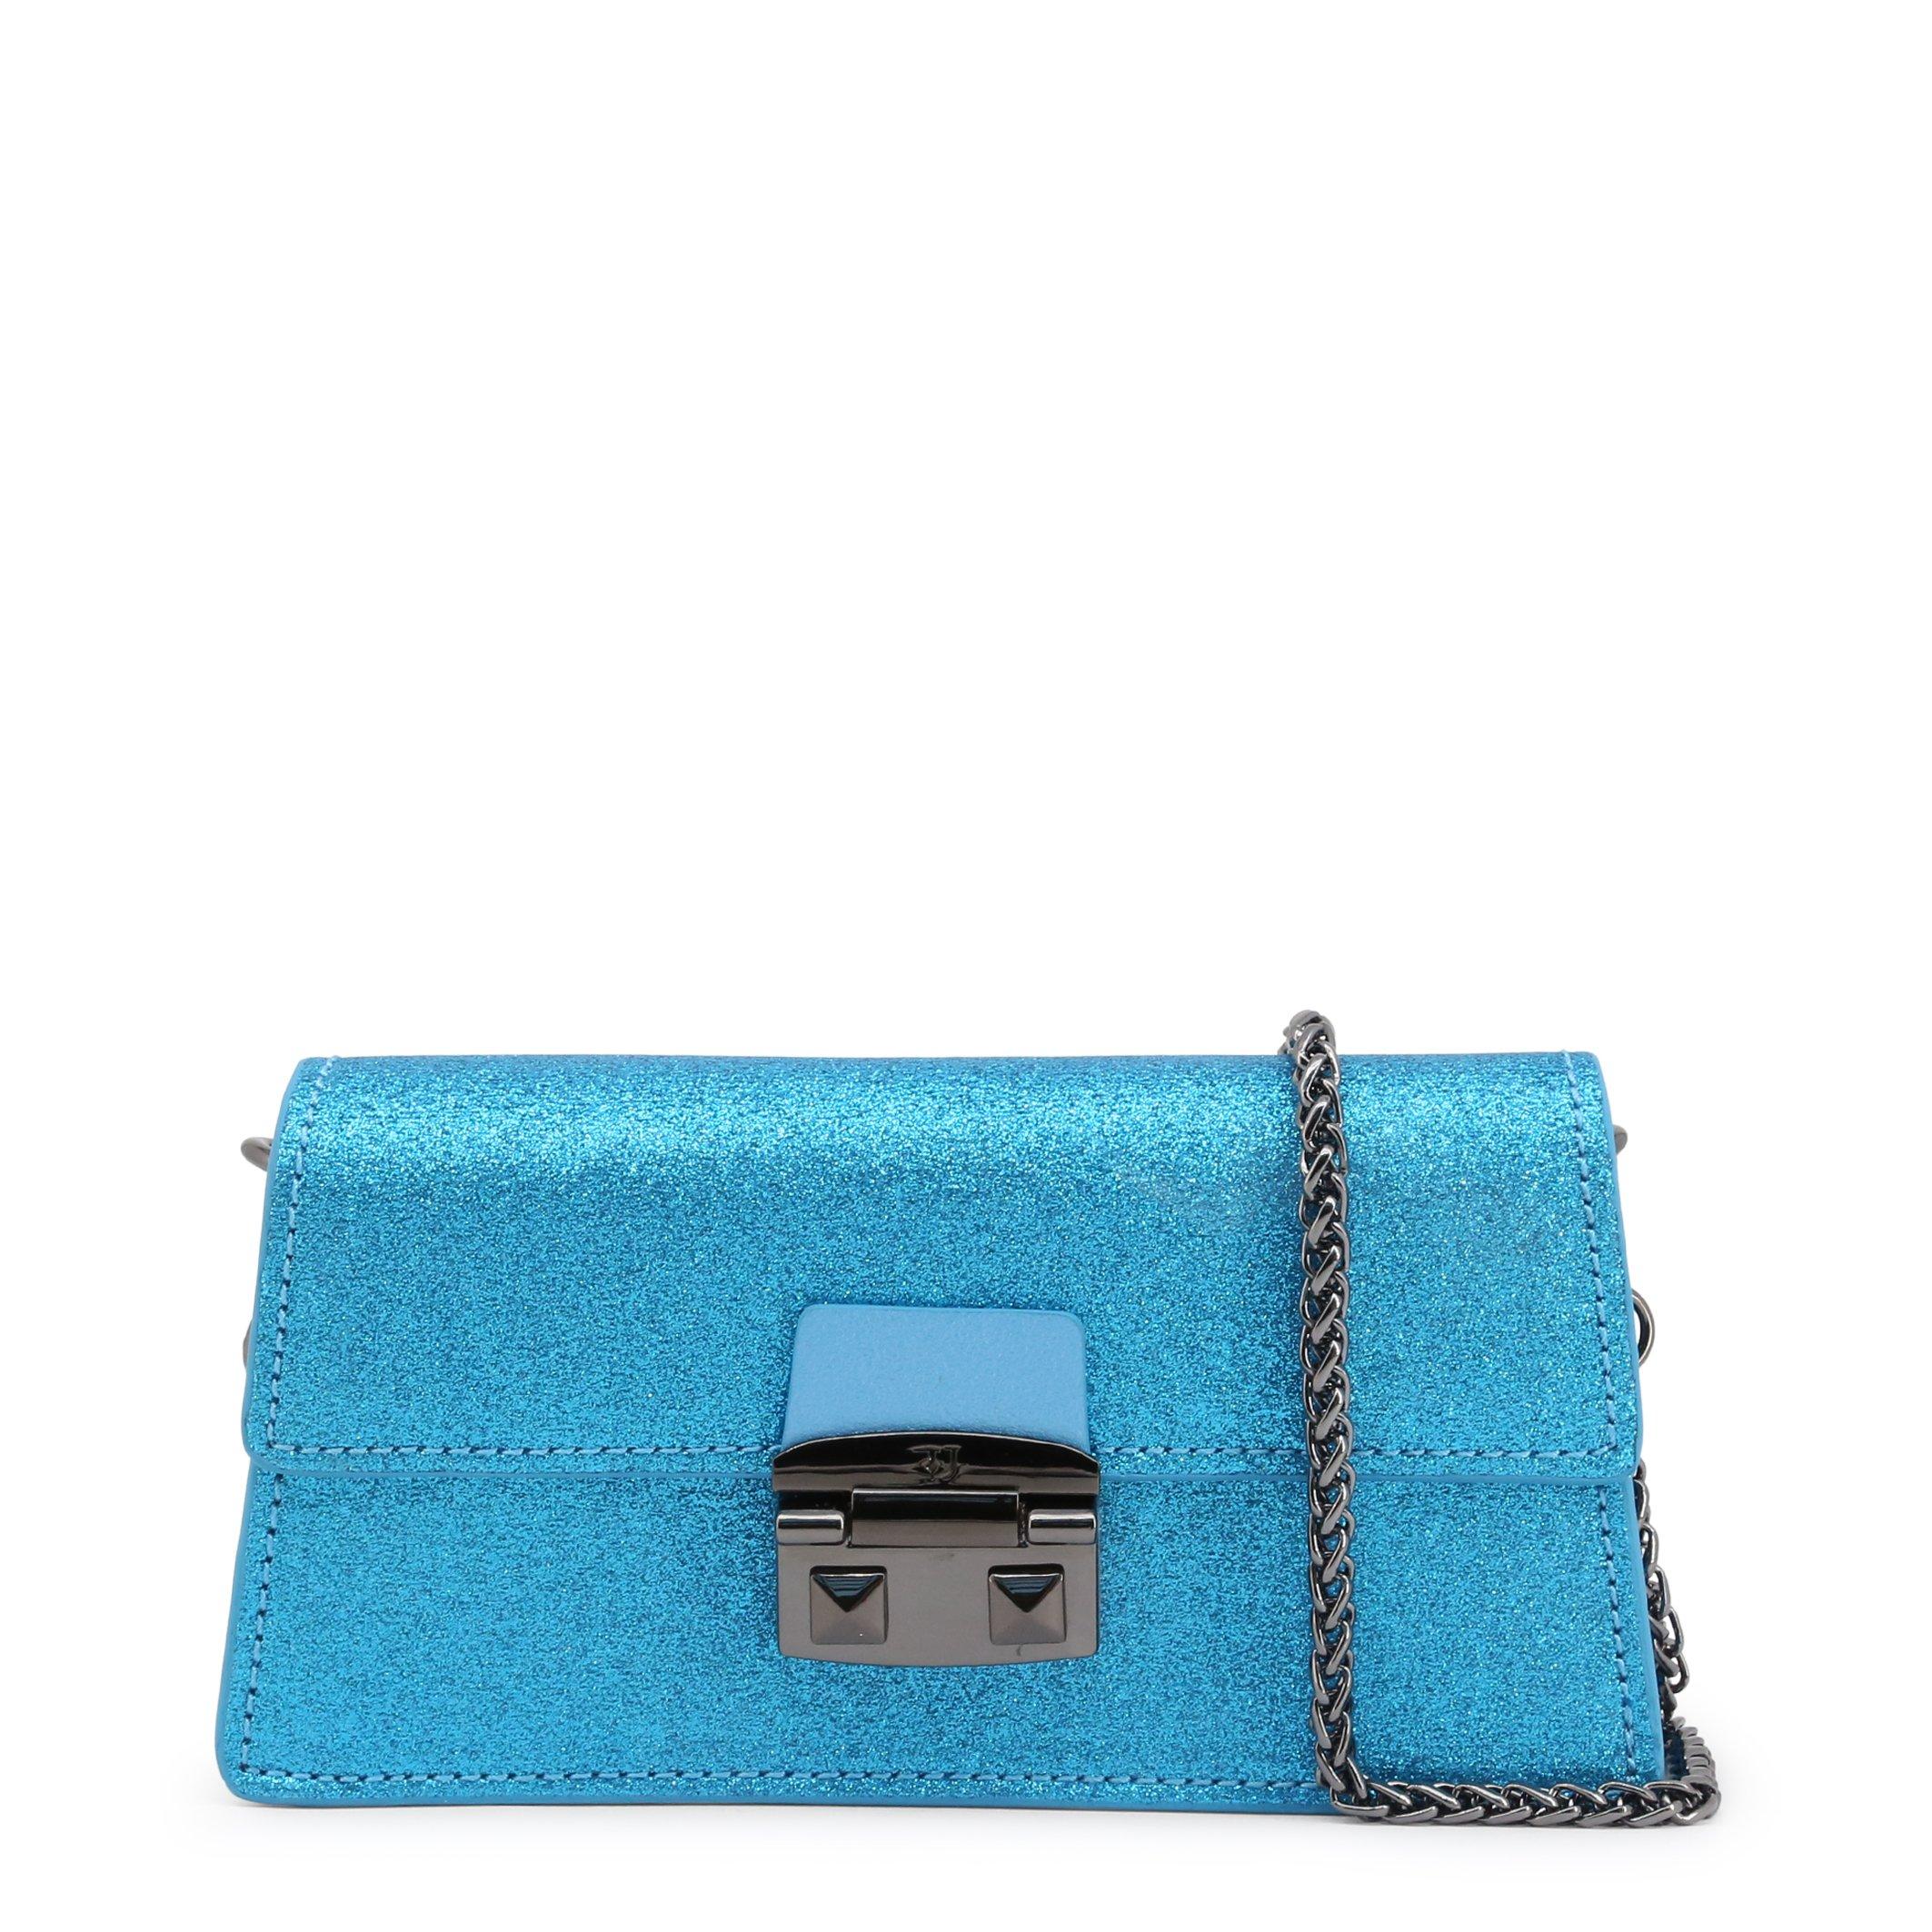 Trussardi Women's Clutch Bag Various Colours CORIANDOLO_75B00554 - blue NOSIZE